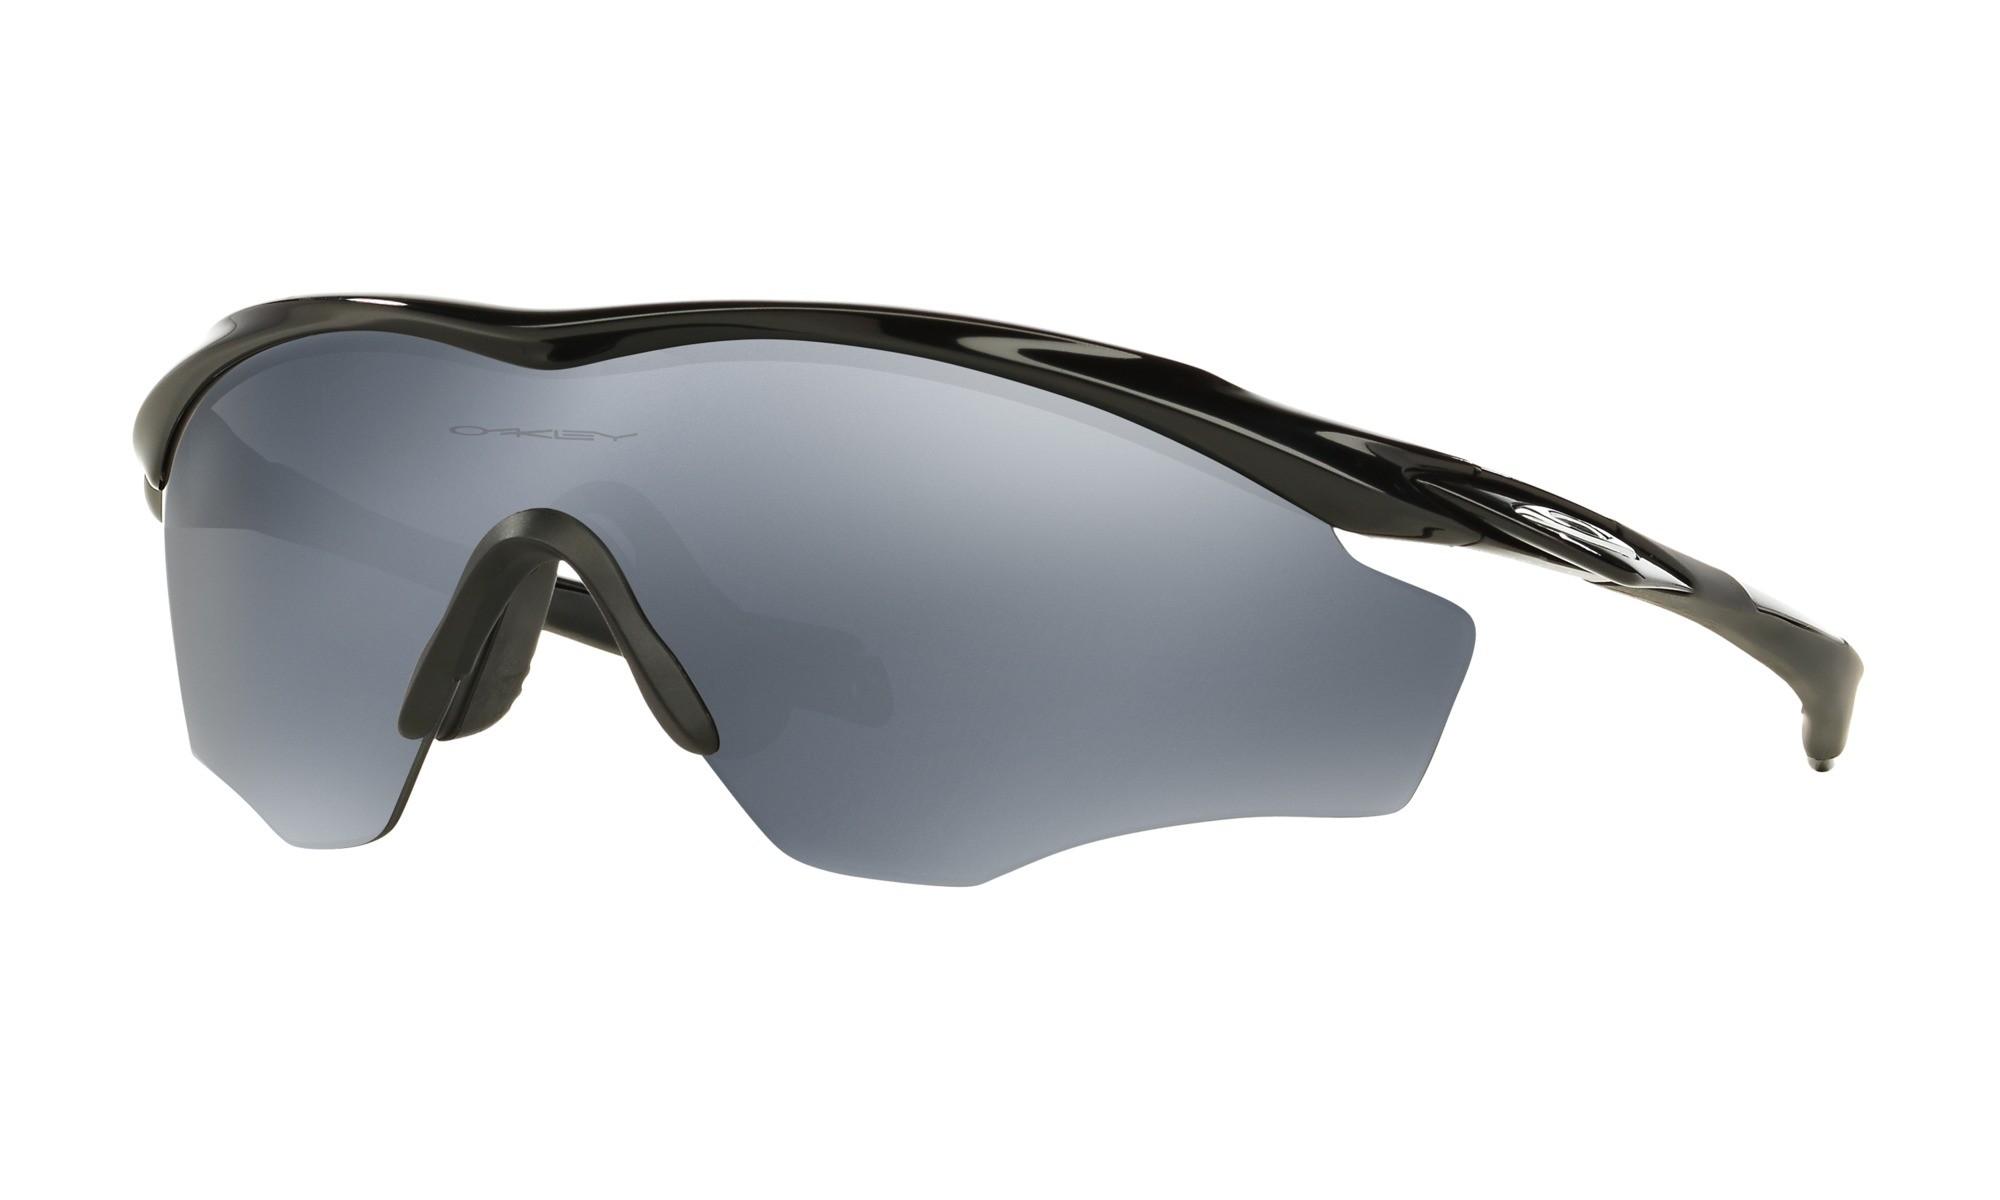 ed43263be5f9 Replica Oakley M2 Frame XL Sunglasses Wholesale polished black frame black  iridium polarized lens